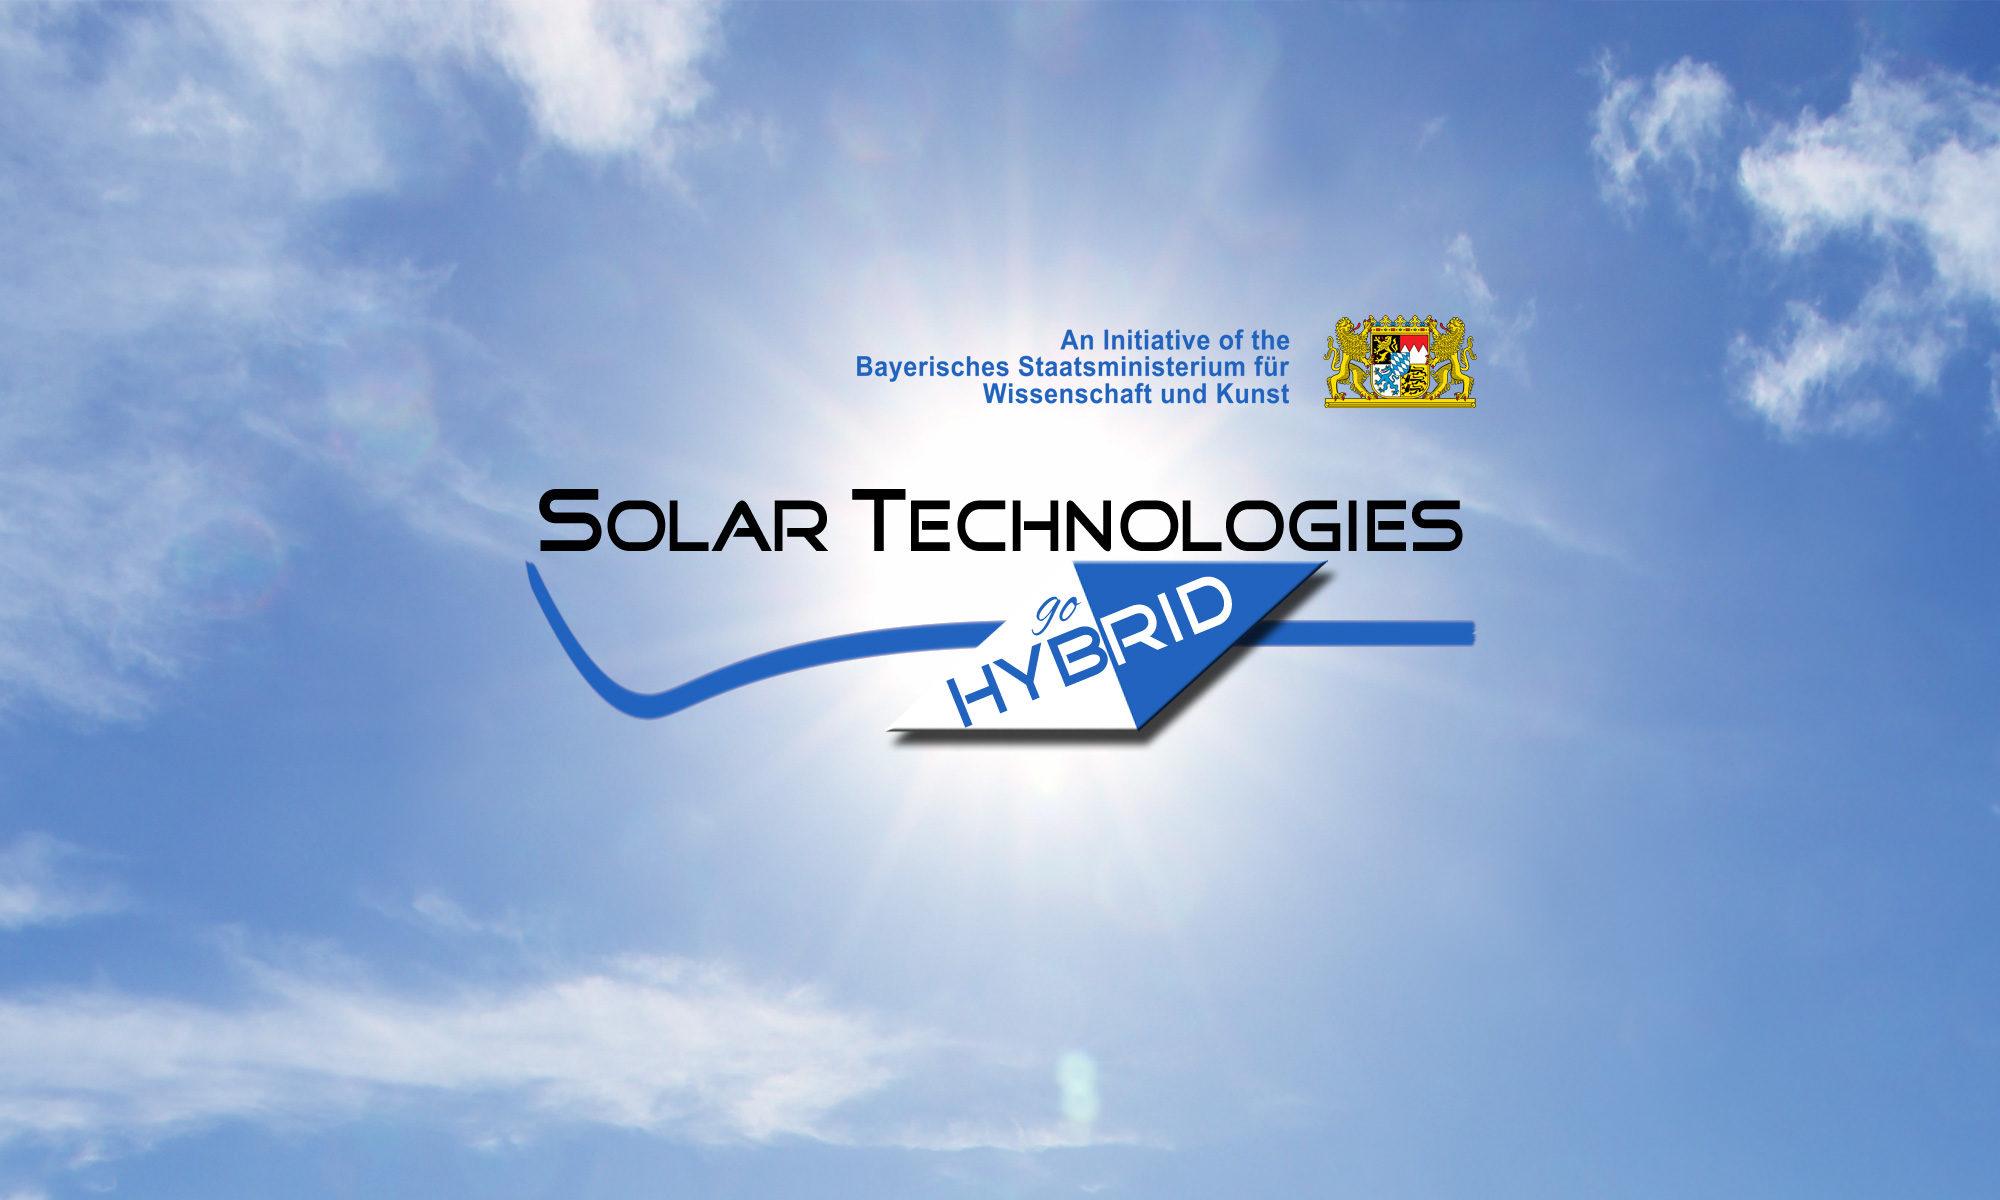 Solar Technologies go Hybrid